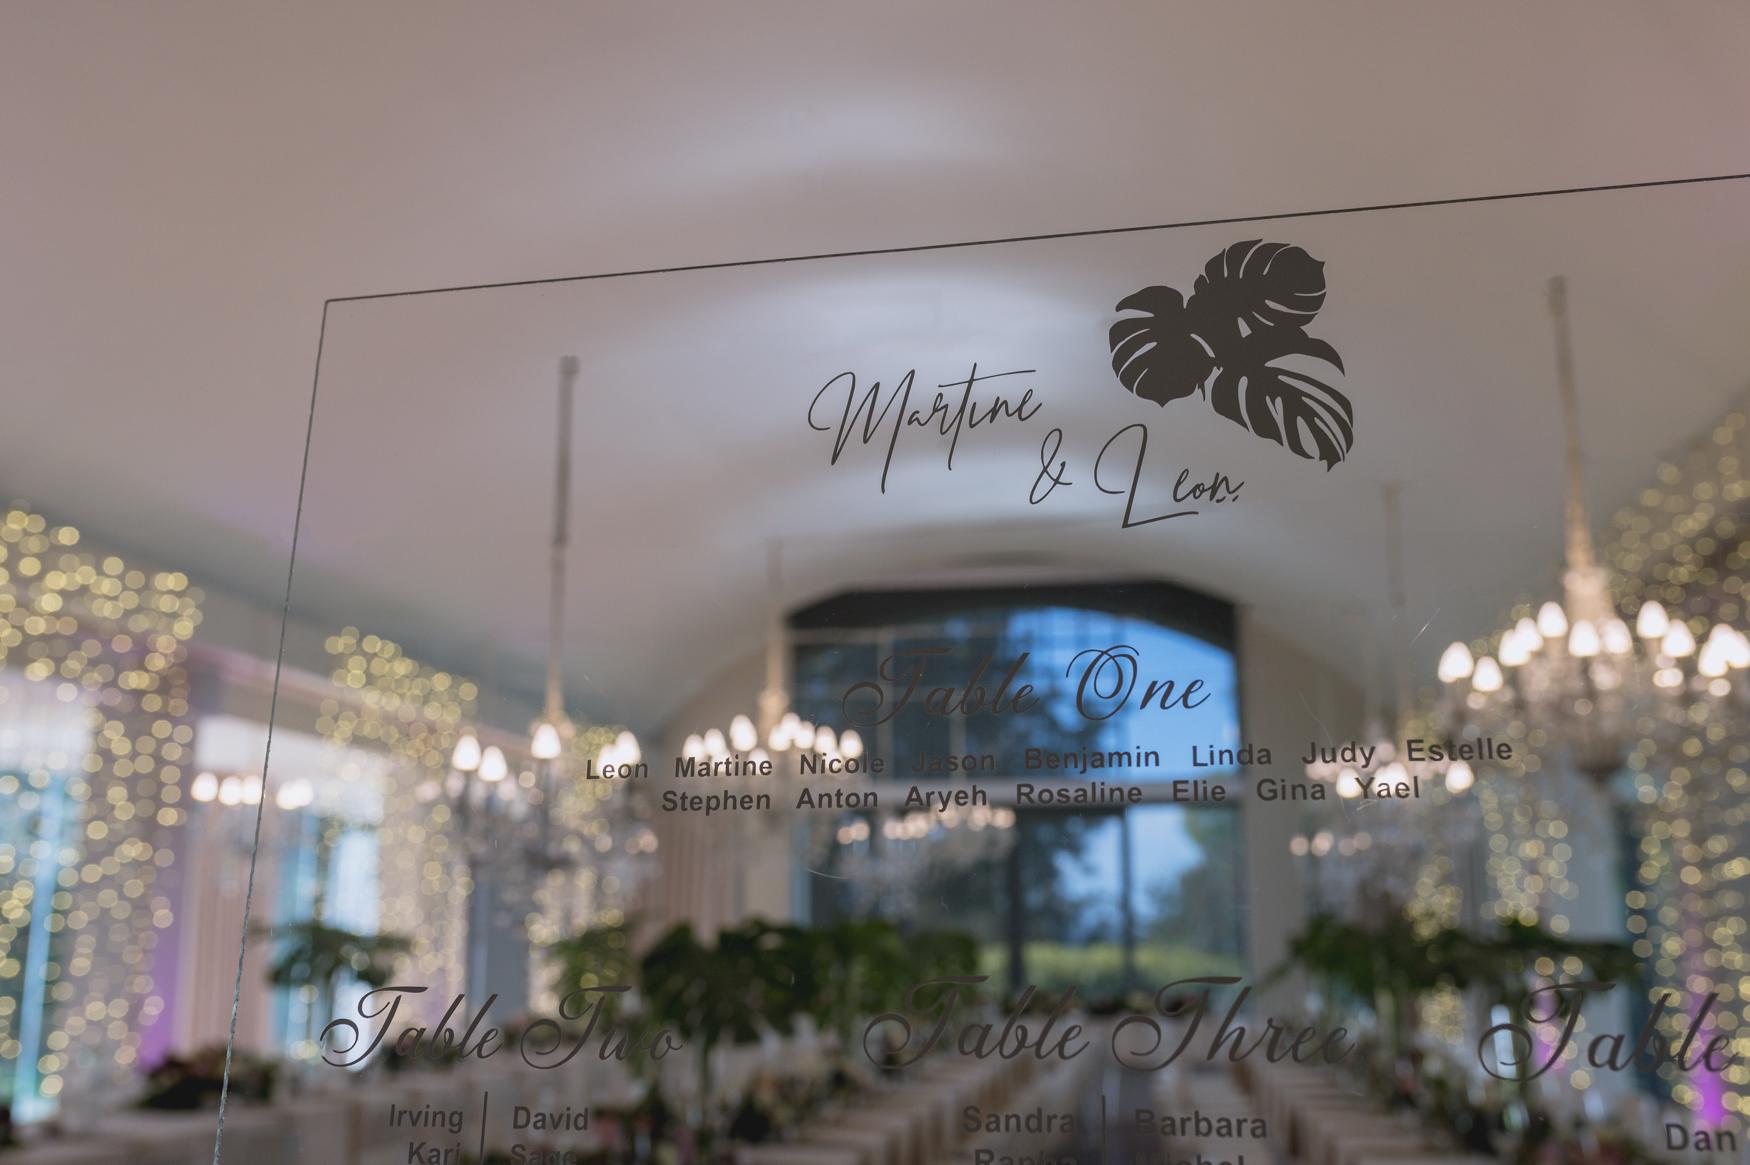 Leon_&_Martine's_Wedding_Photographs_17th_April_2019_@johnhenryweddingphoto_Low_Resolution_Web-010.JPG